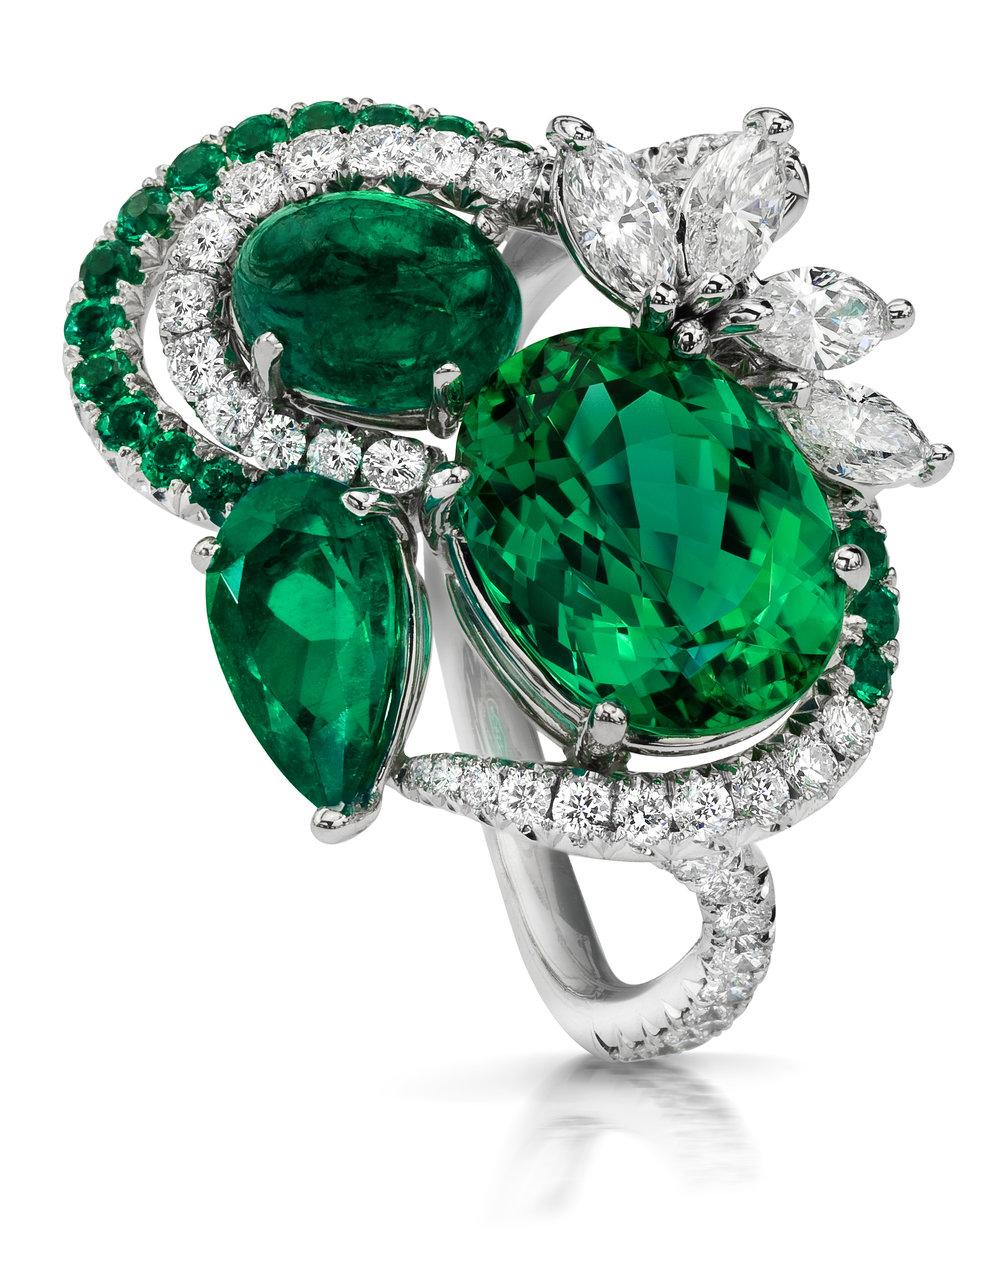 Oval-Pear-Emerald Ring.jpg